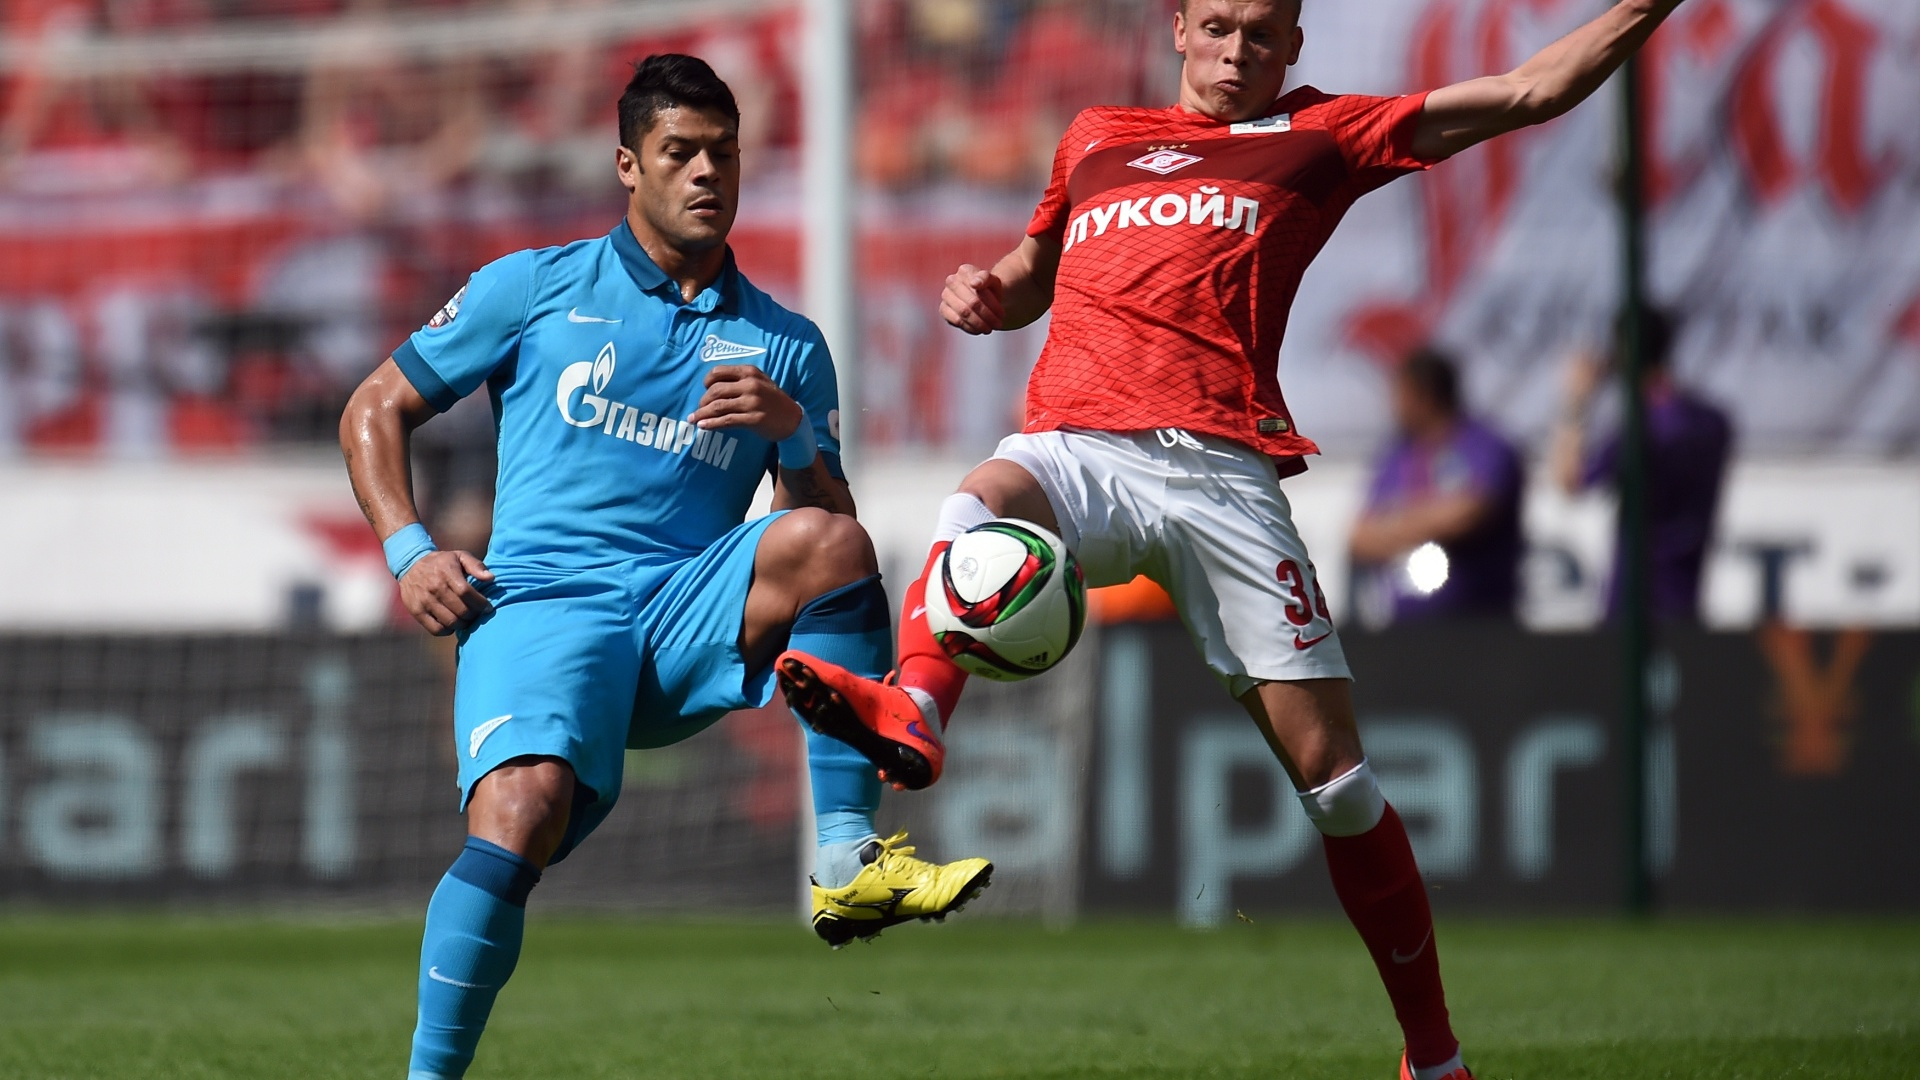 Hulk disputa bola com Yevgeni Makeyv, do Spartak Moscou